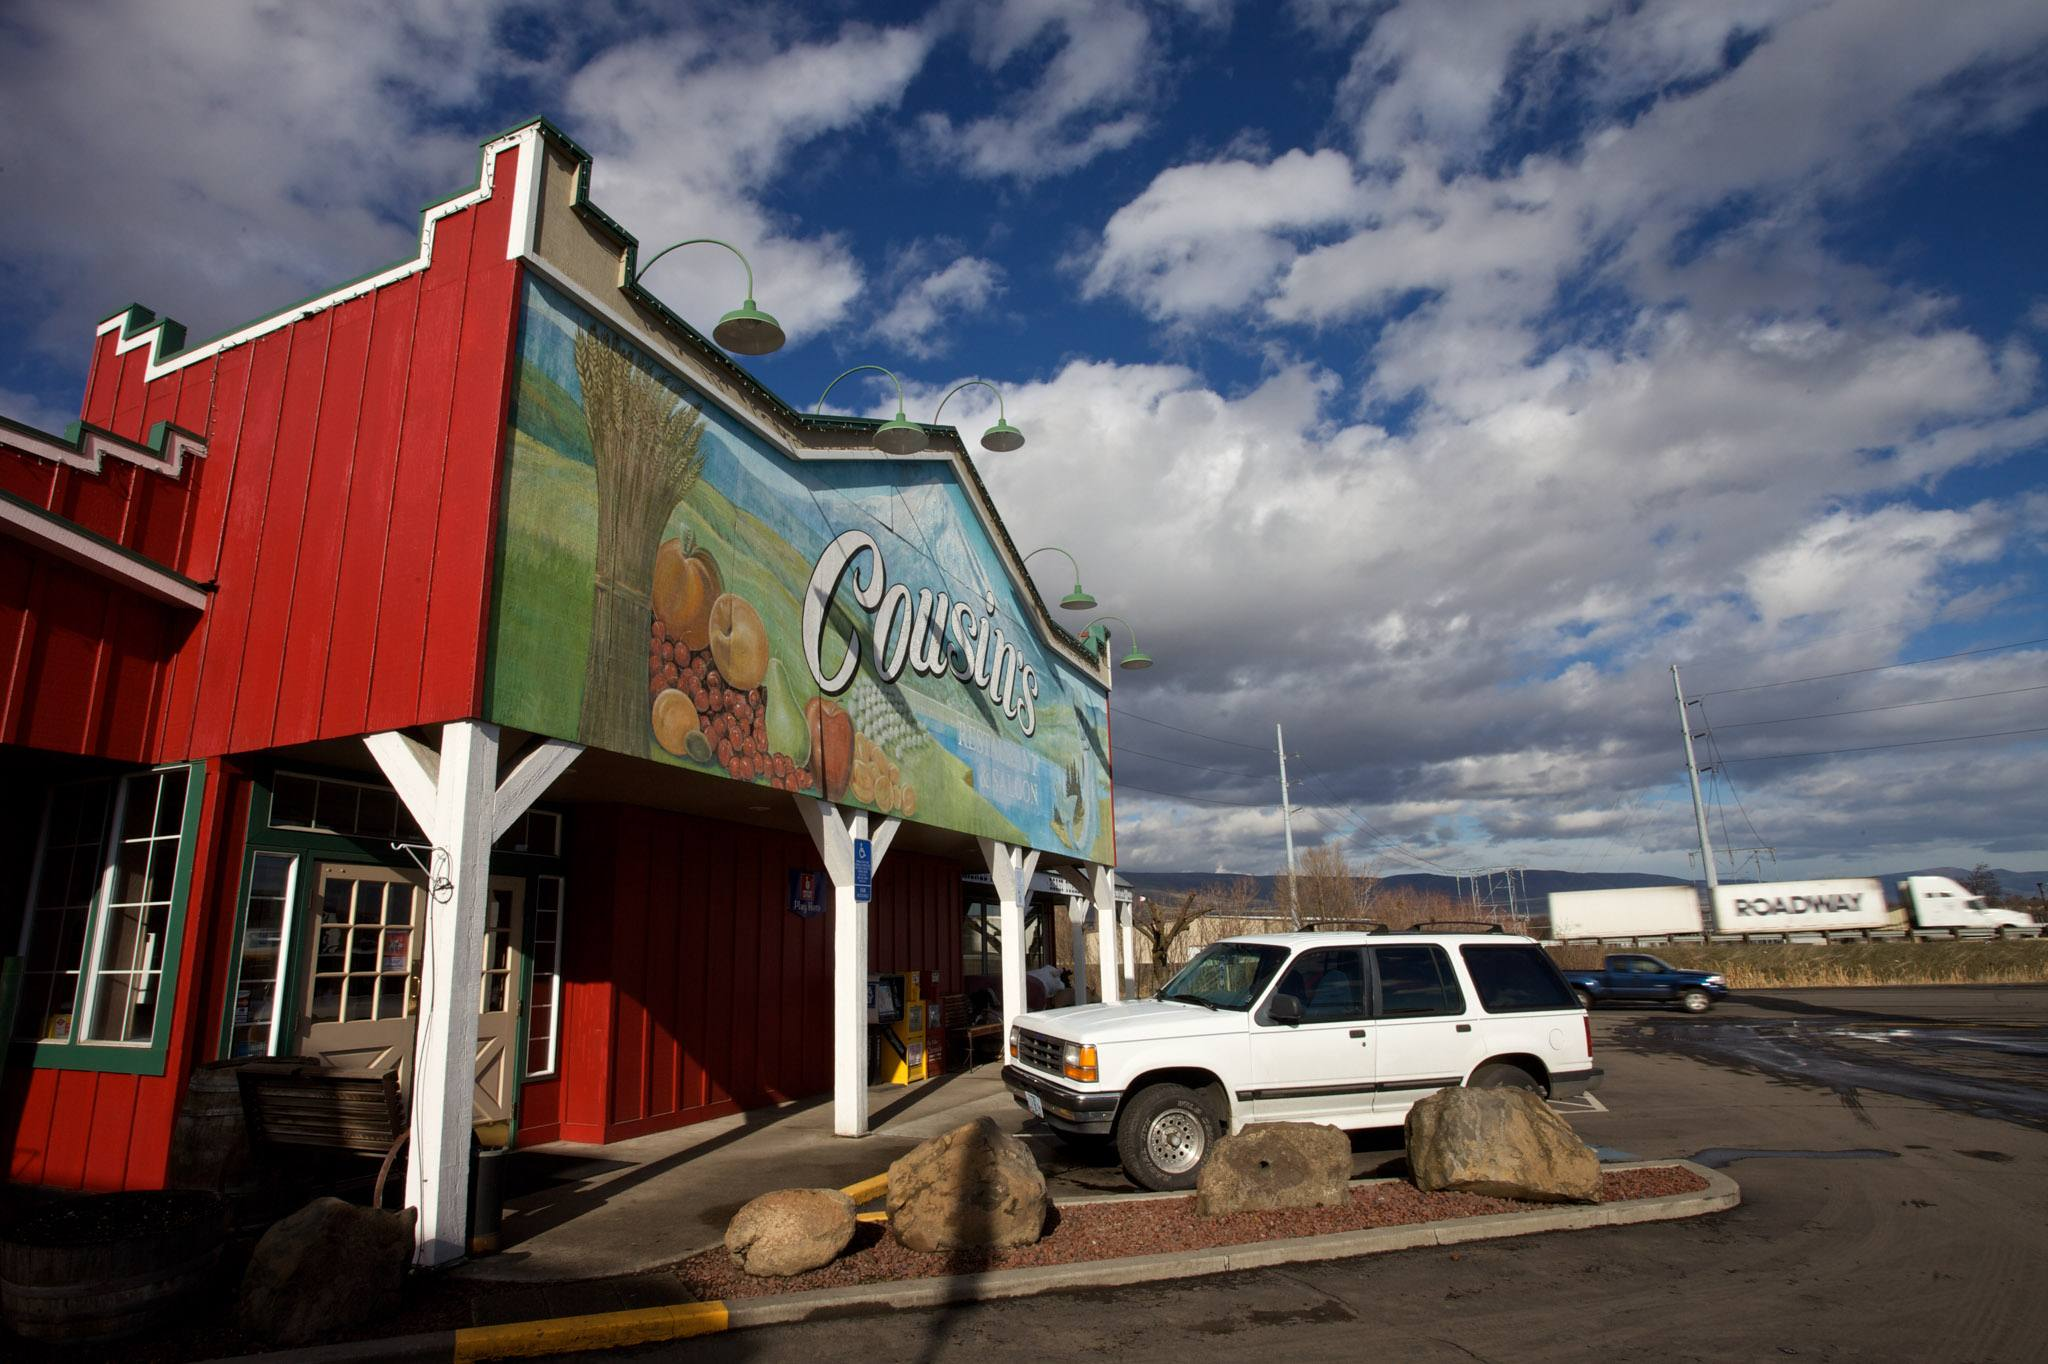 Cousins' Restaurant and Saloon